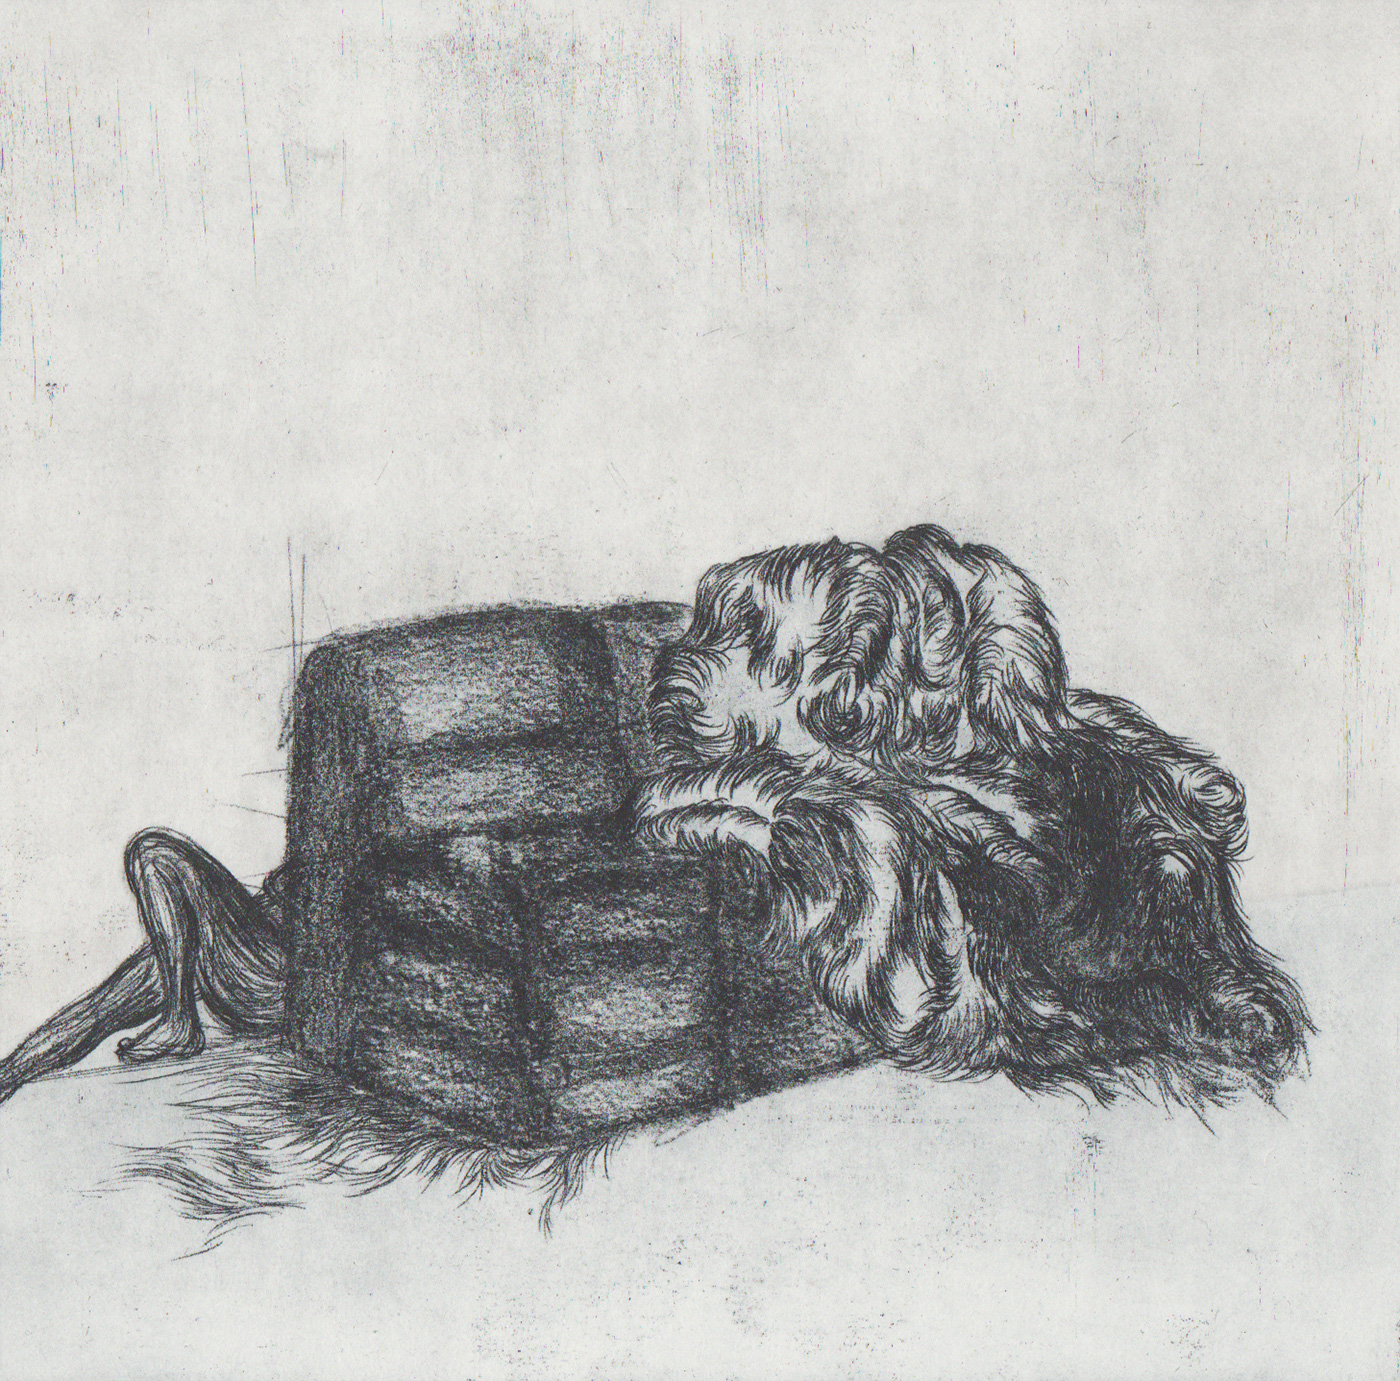 <i>Roseros</i>, édition encrage alma, 2014 - gravure, verni mou